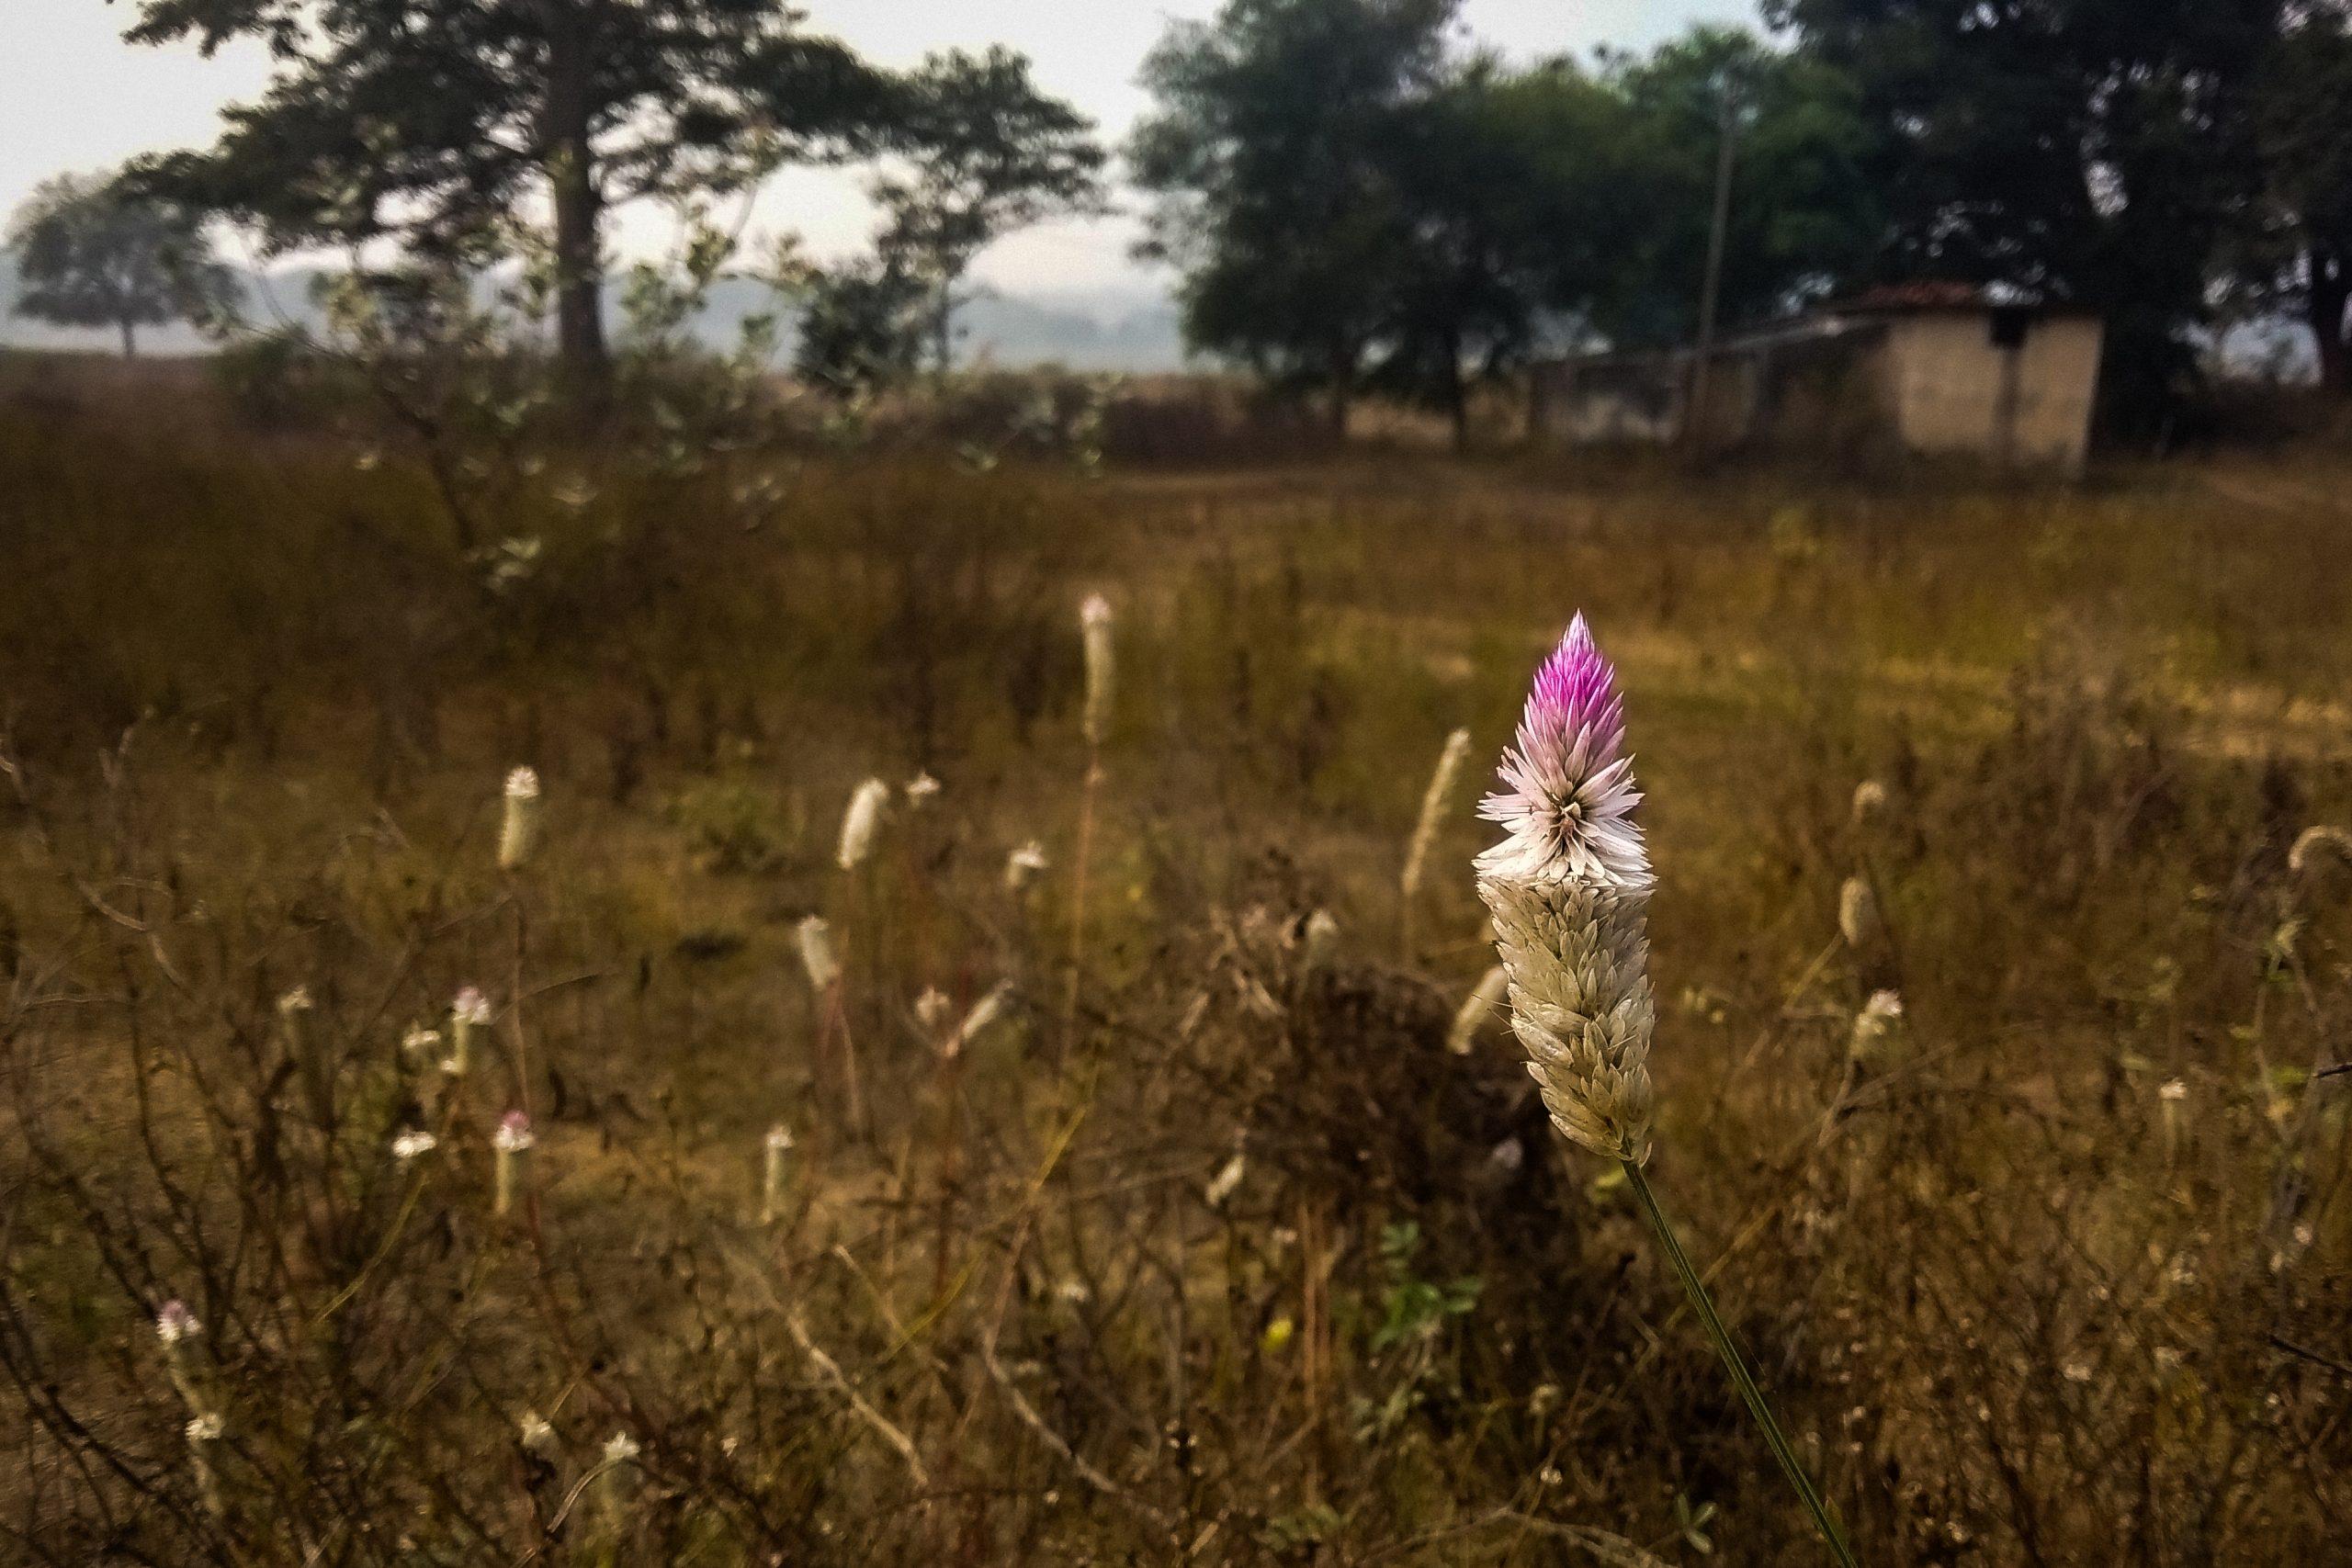 wildflowers and grassland